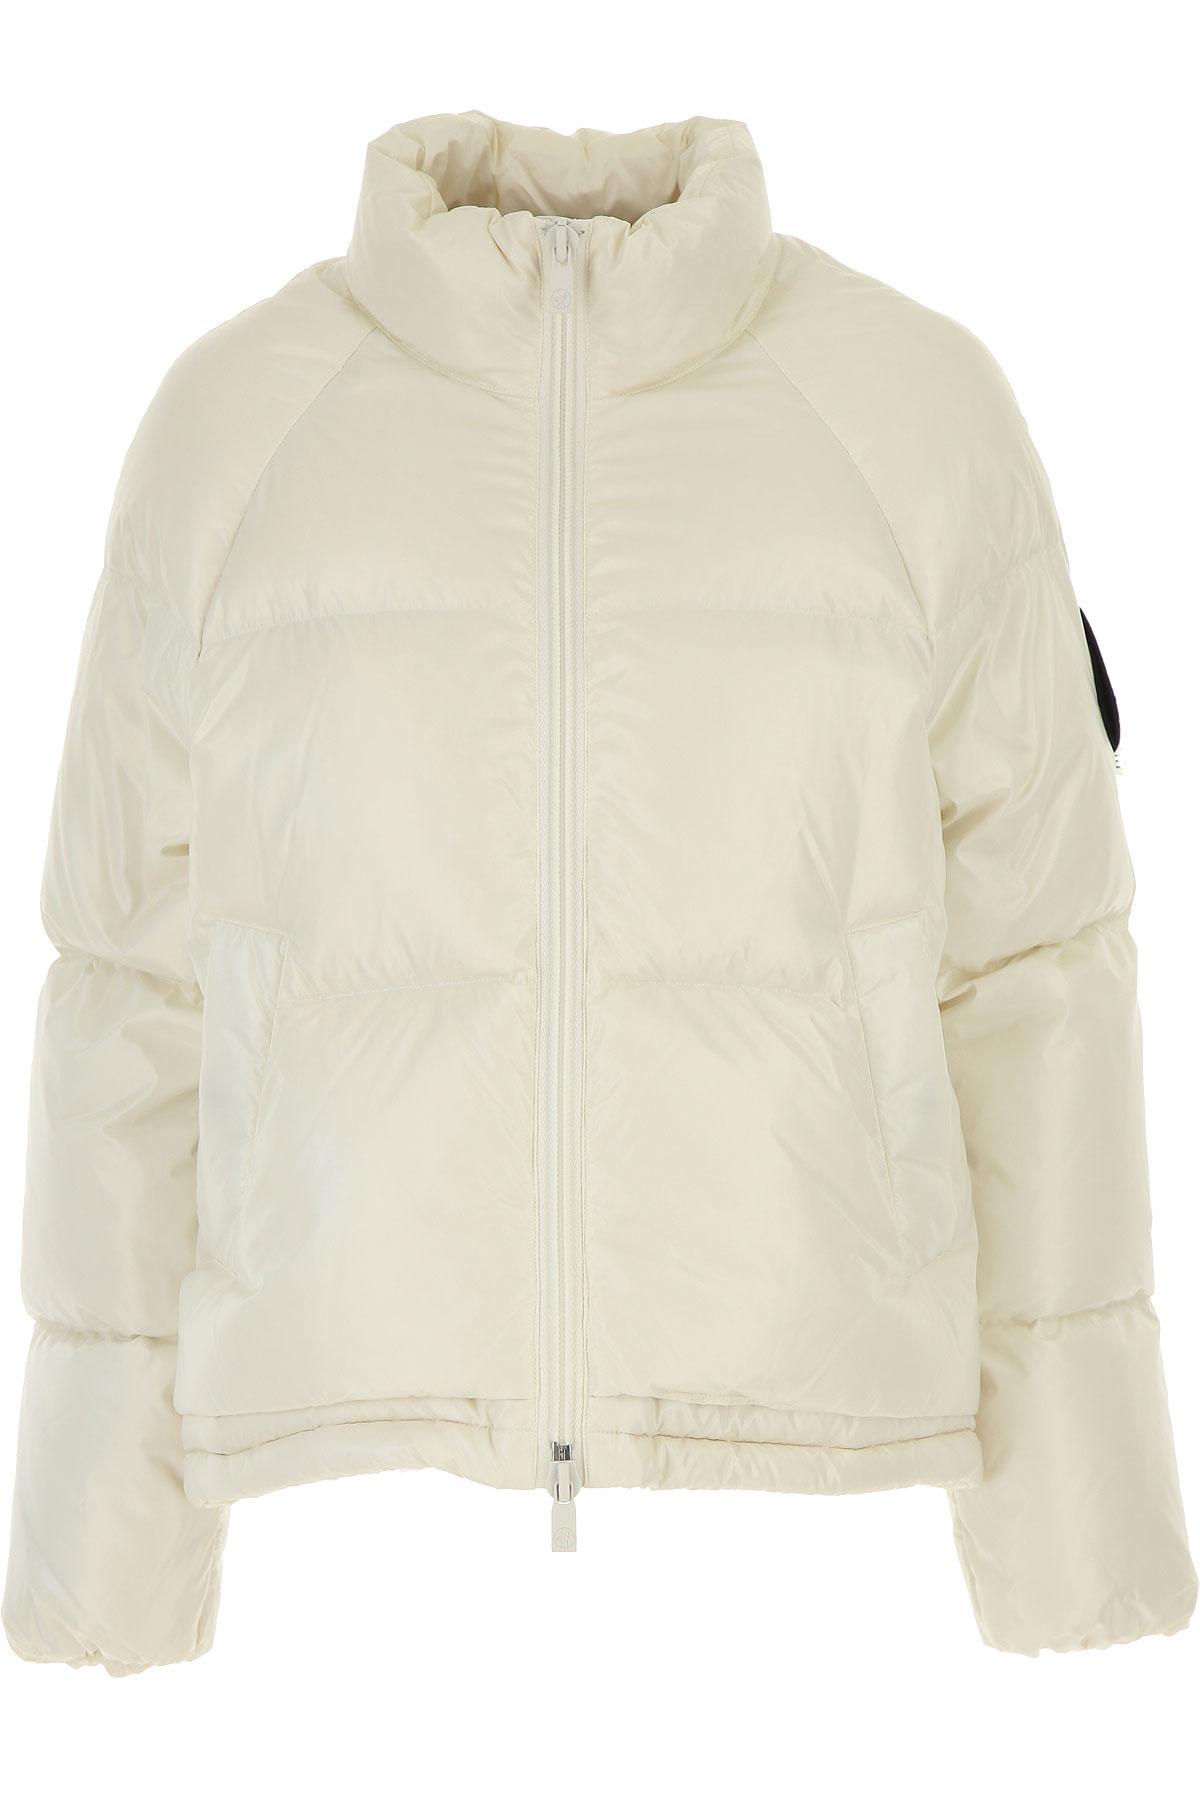 Ciesse Piumini Down Jacket for Women, Puffer Ski Jacket On Sale, Ivory, Nylon, 2019, 4 6